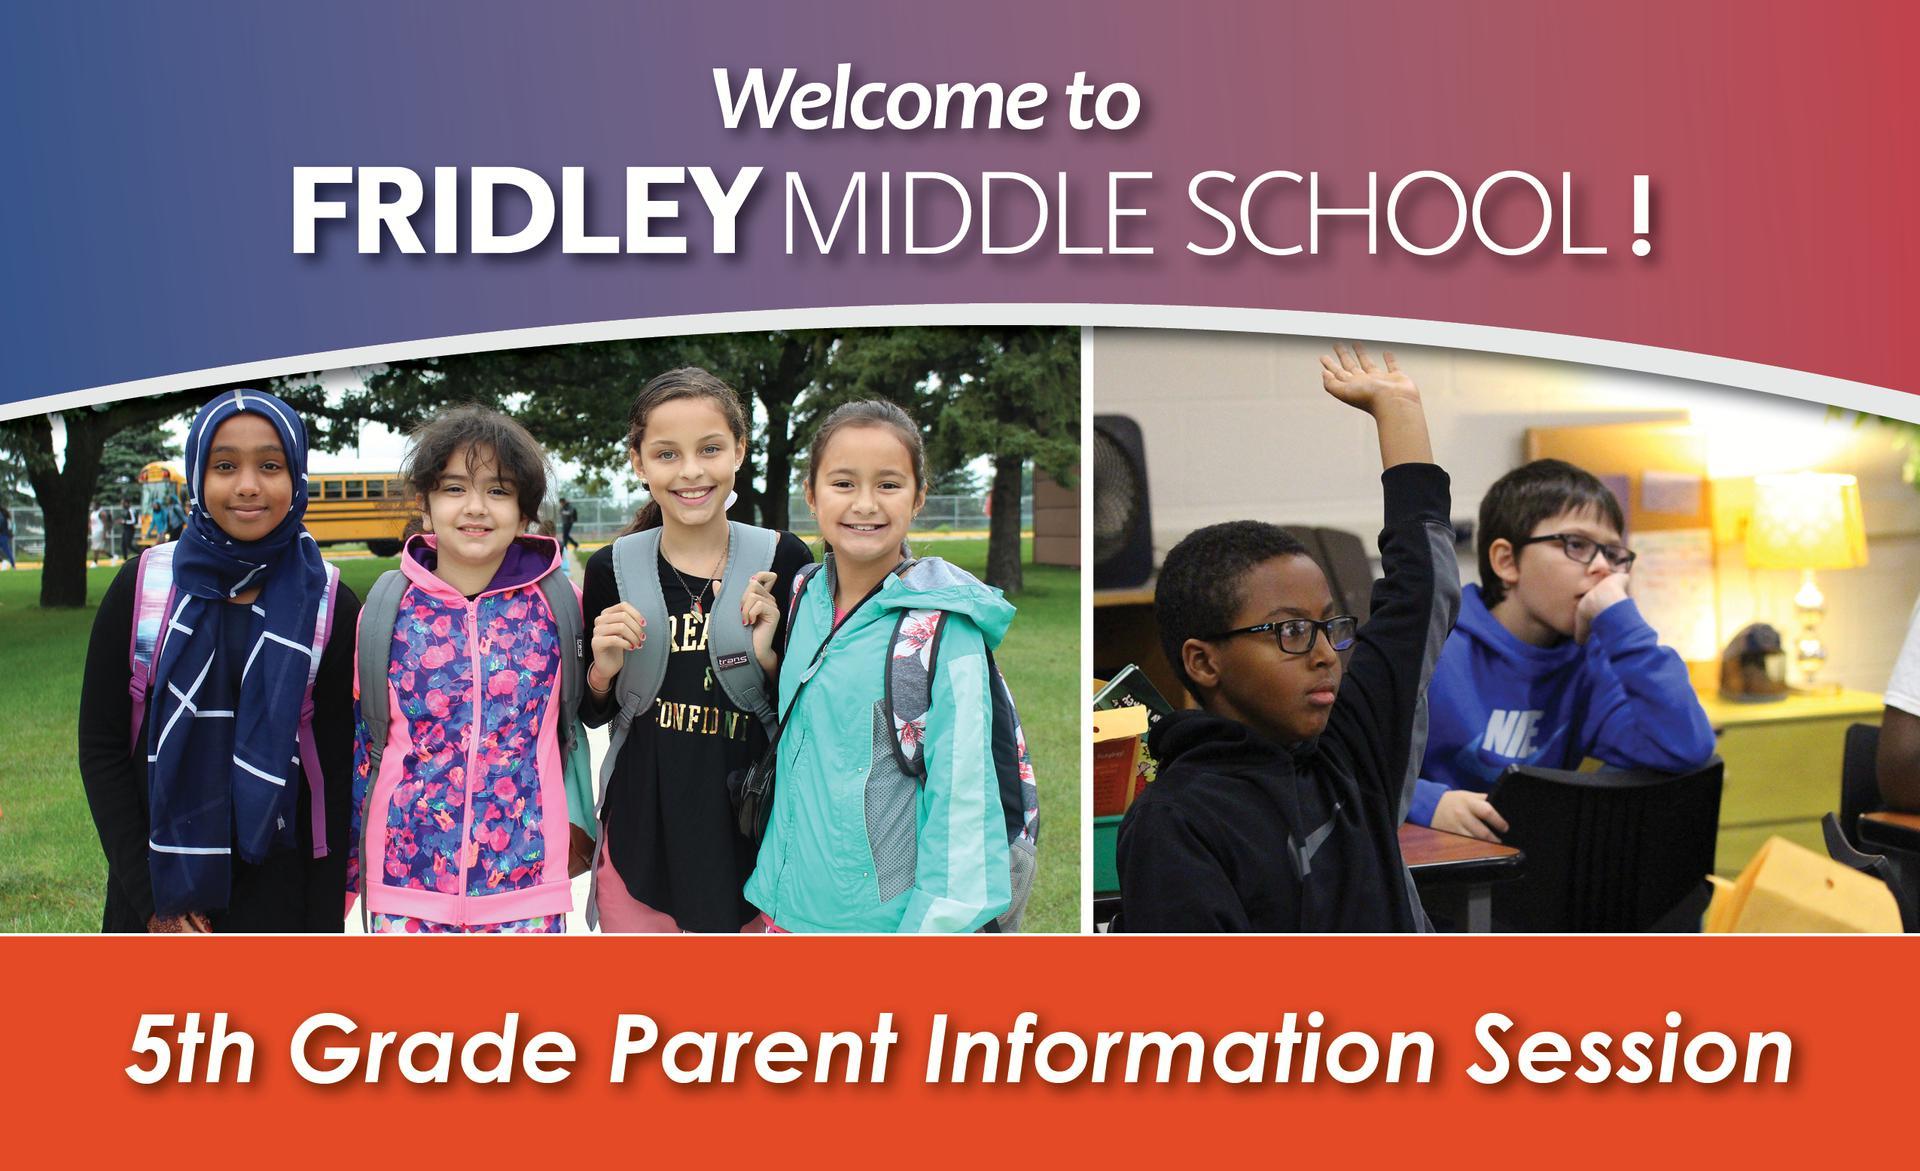 FMS 5th Grade Parent Information Session